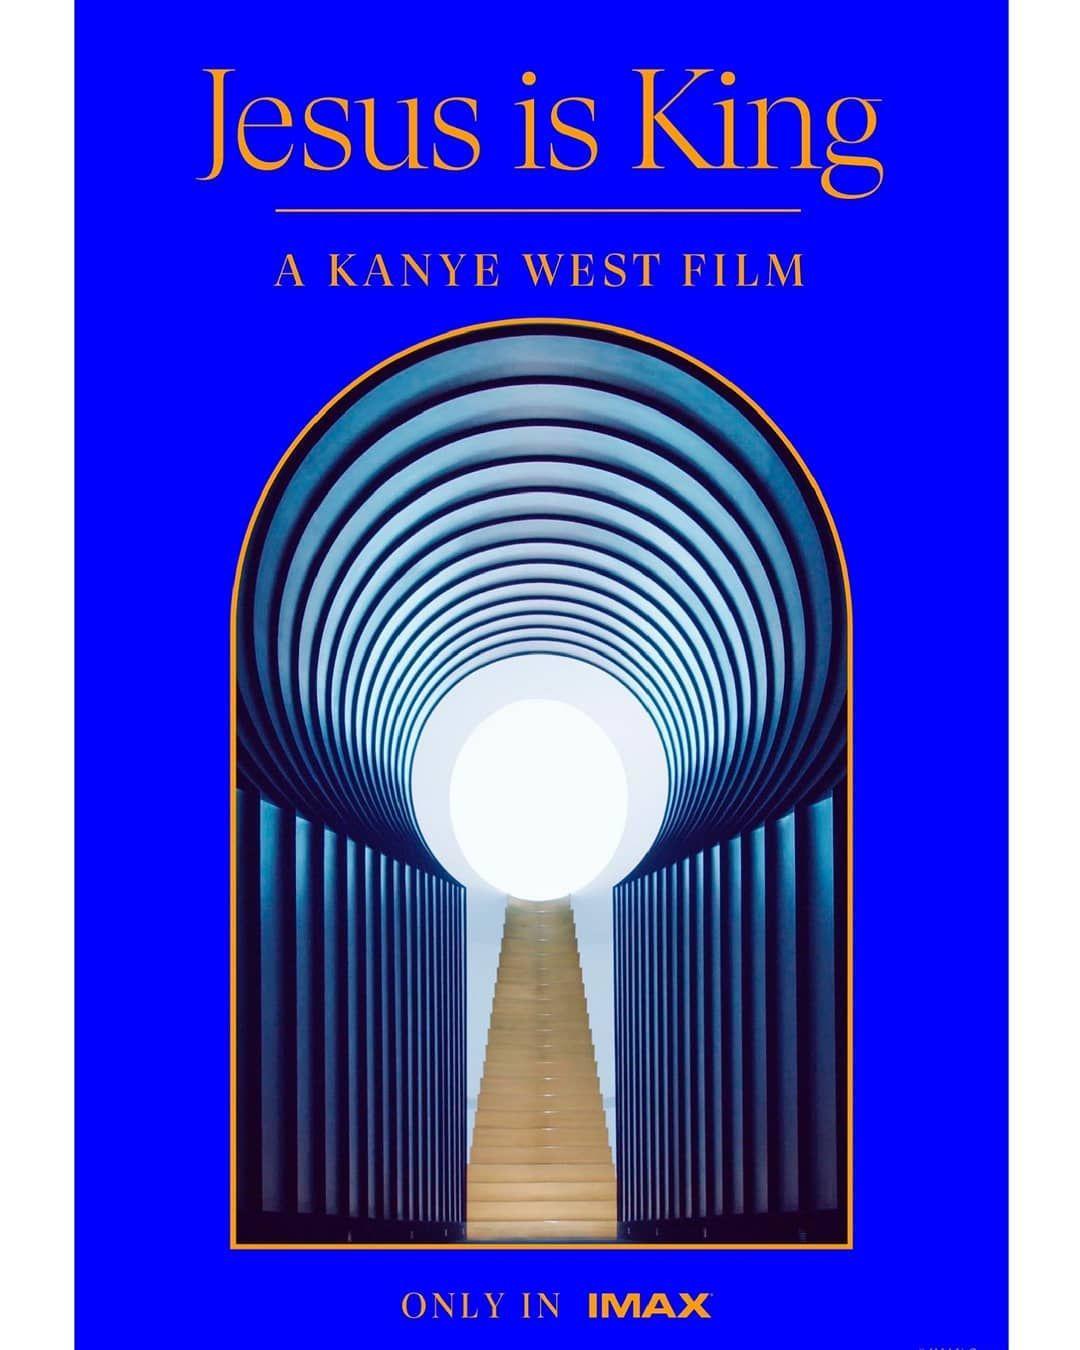 Poster Enviado Via Airdrop Para Os Fas Ontem Na Exibicao Do Jesus Is King A Kanye West Experience Kanyewest Ye Yeez Kanye West Kanye Jesus Is King Kanye